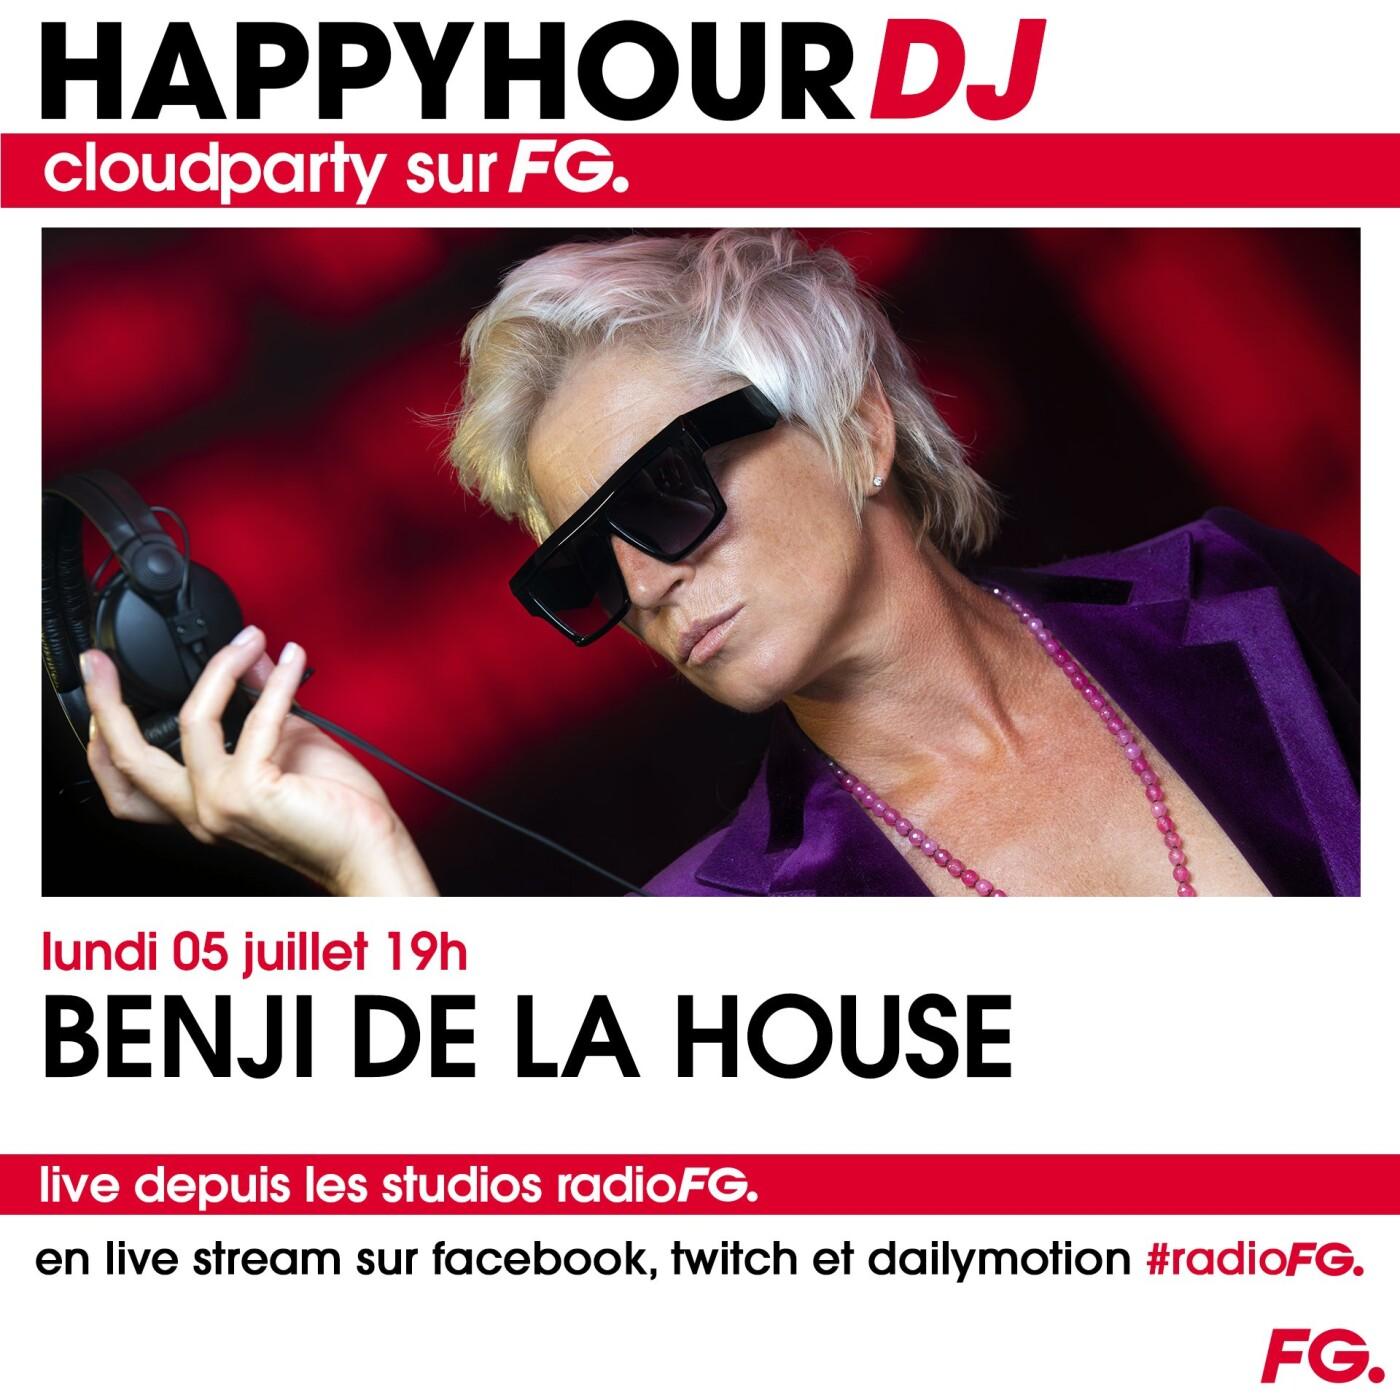 HAPPY HOUR DJ : BENJI DE LA HOUSE